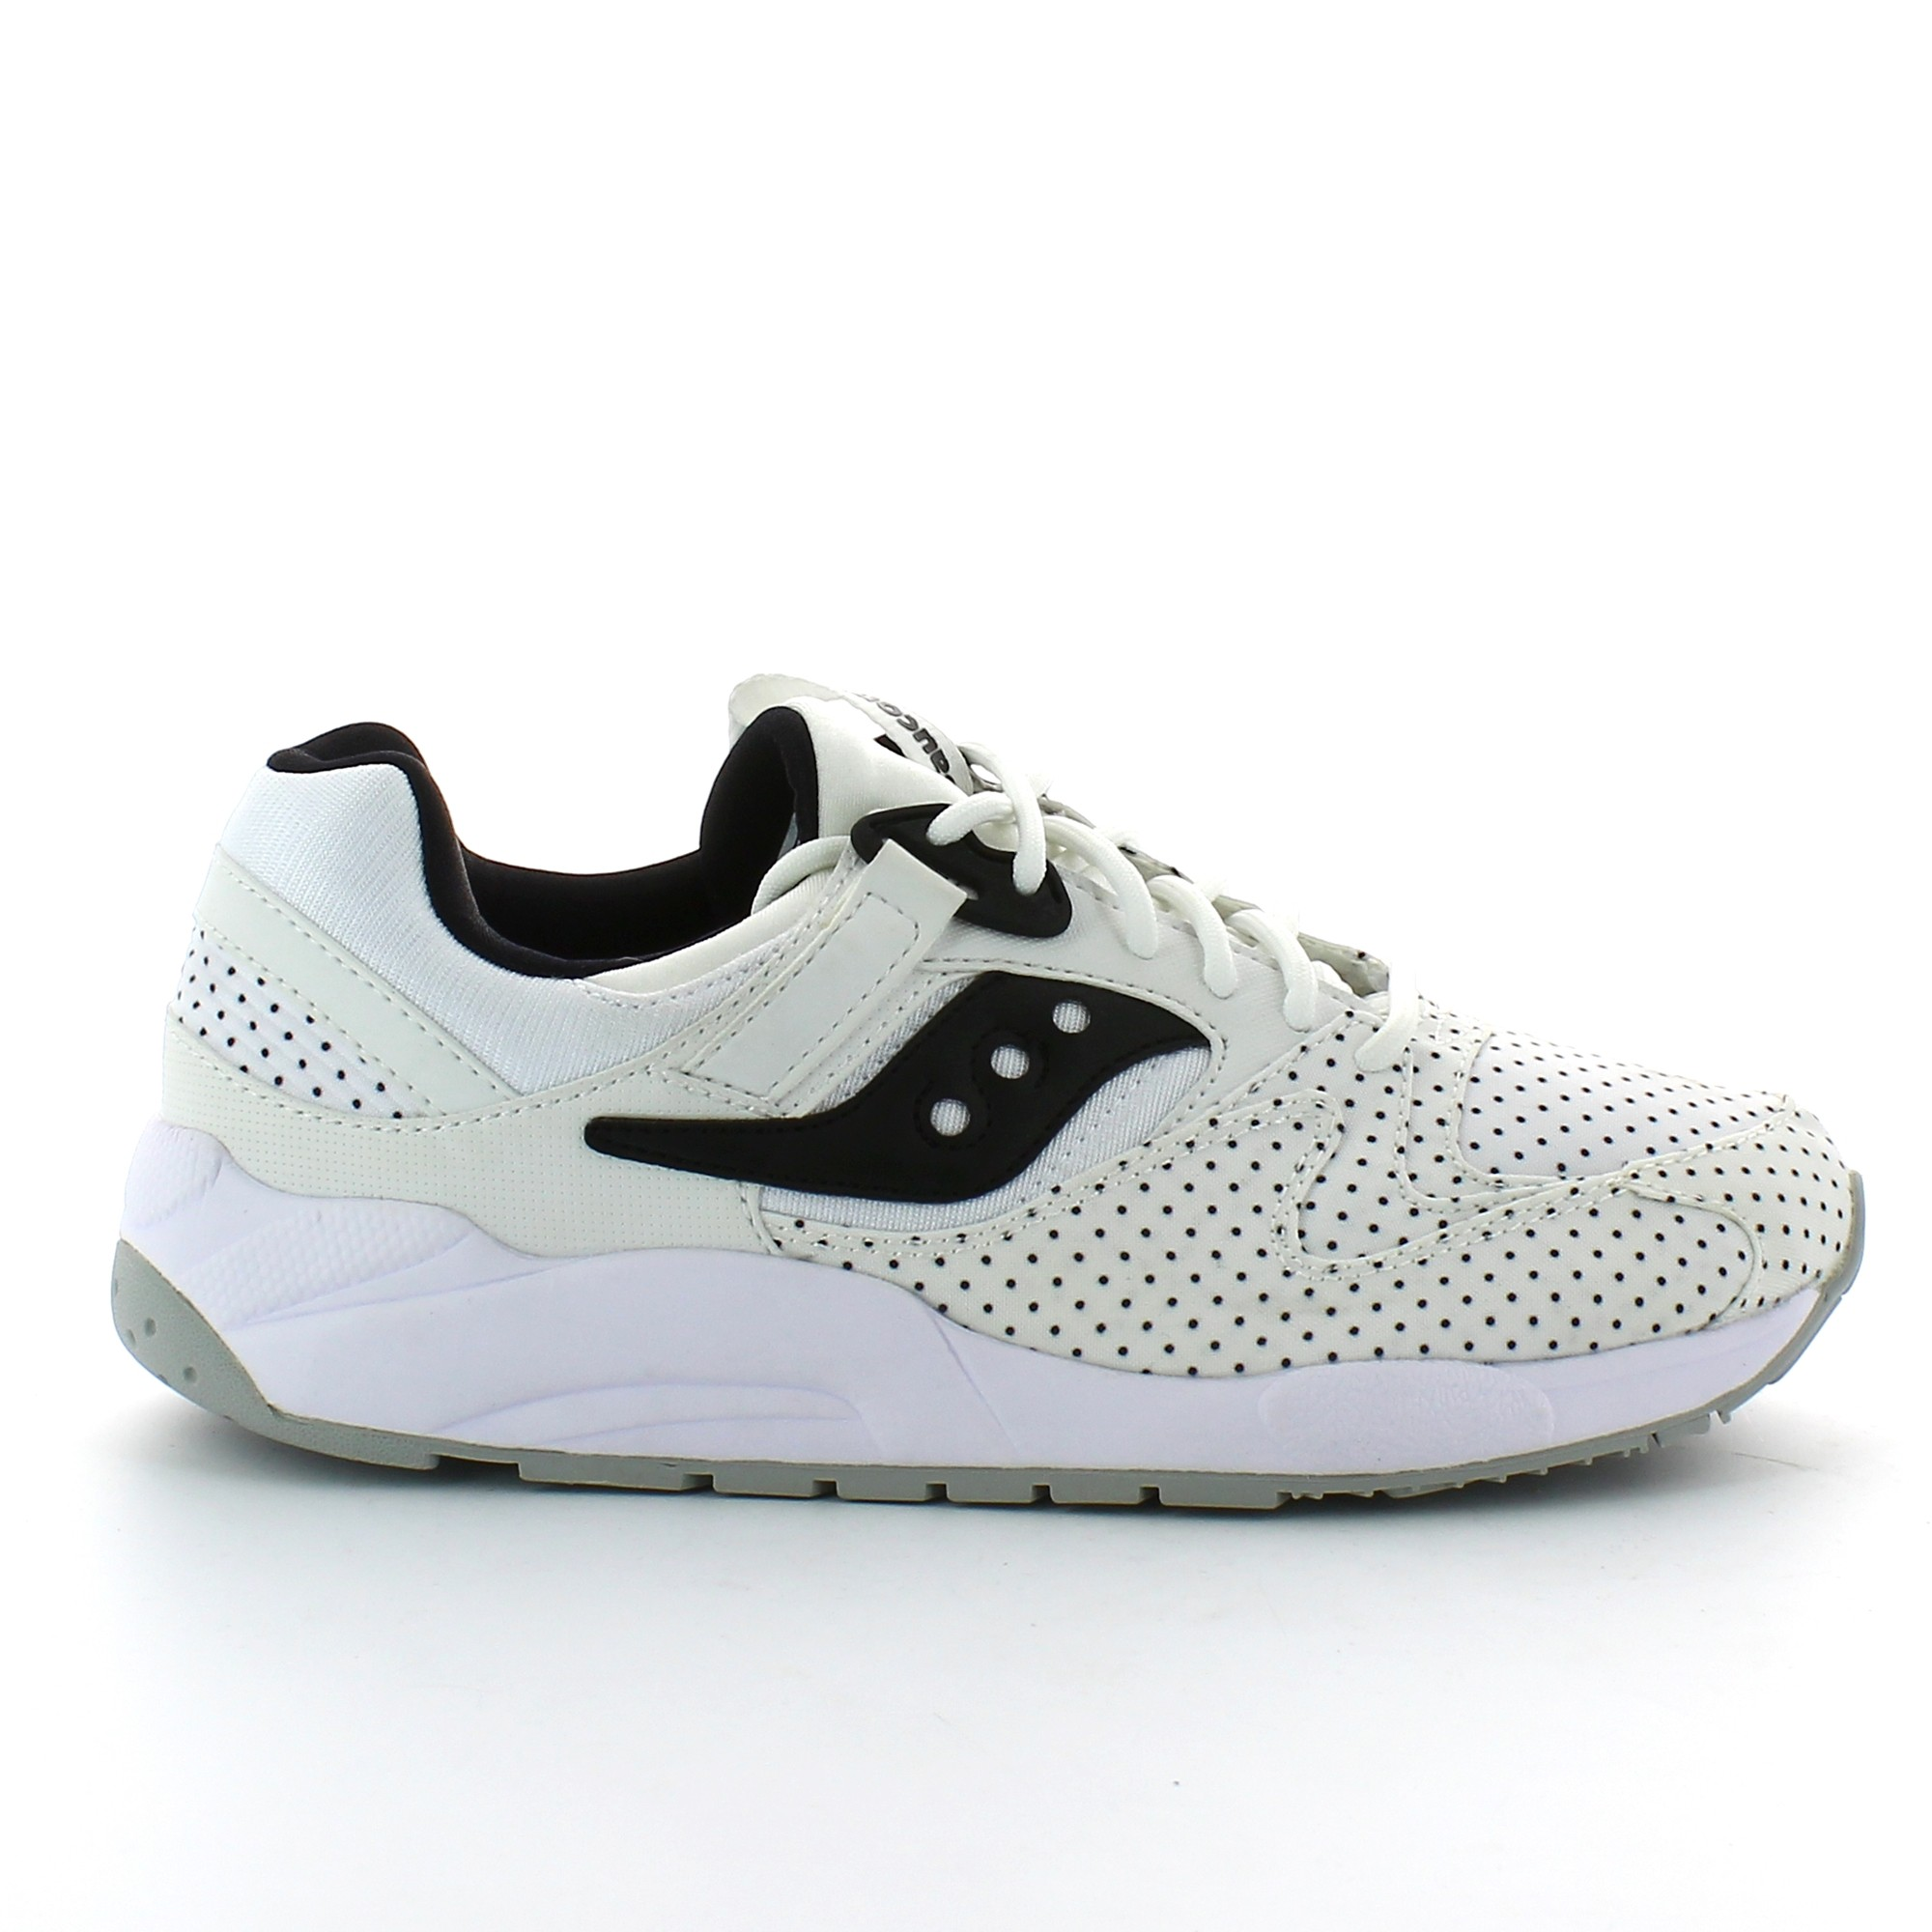 hombre zapatos deportivos moda saucony originals grid 9000